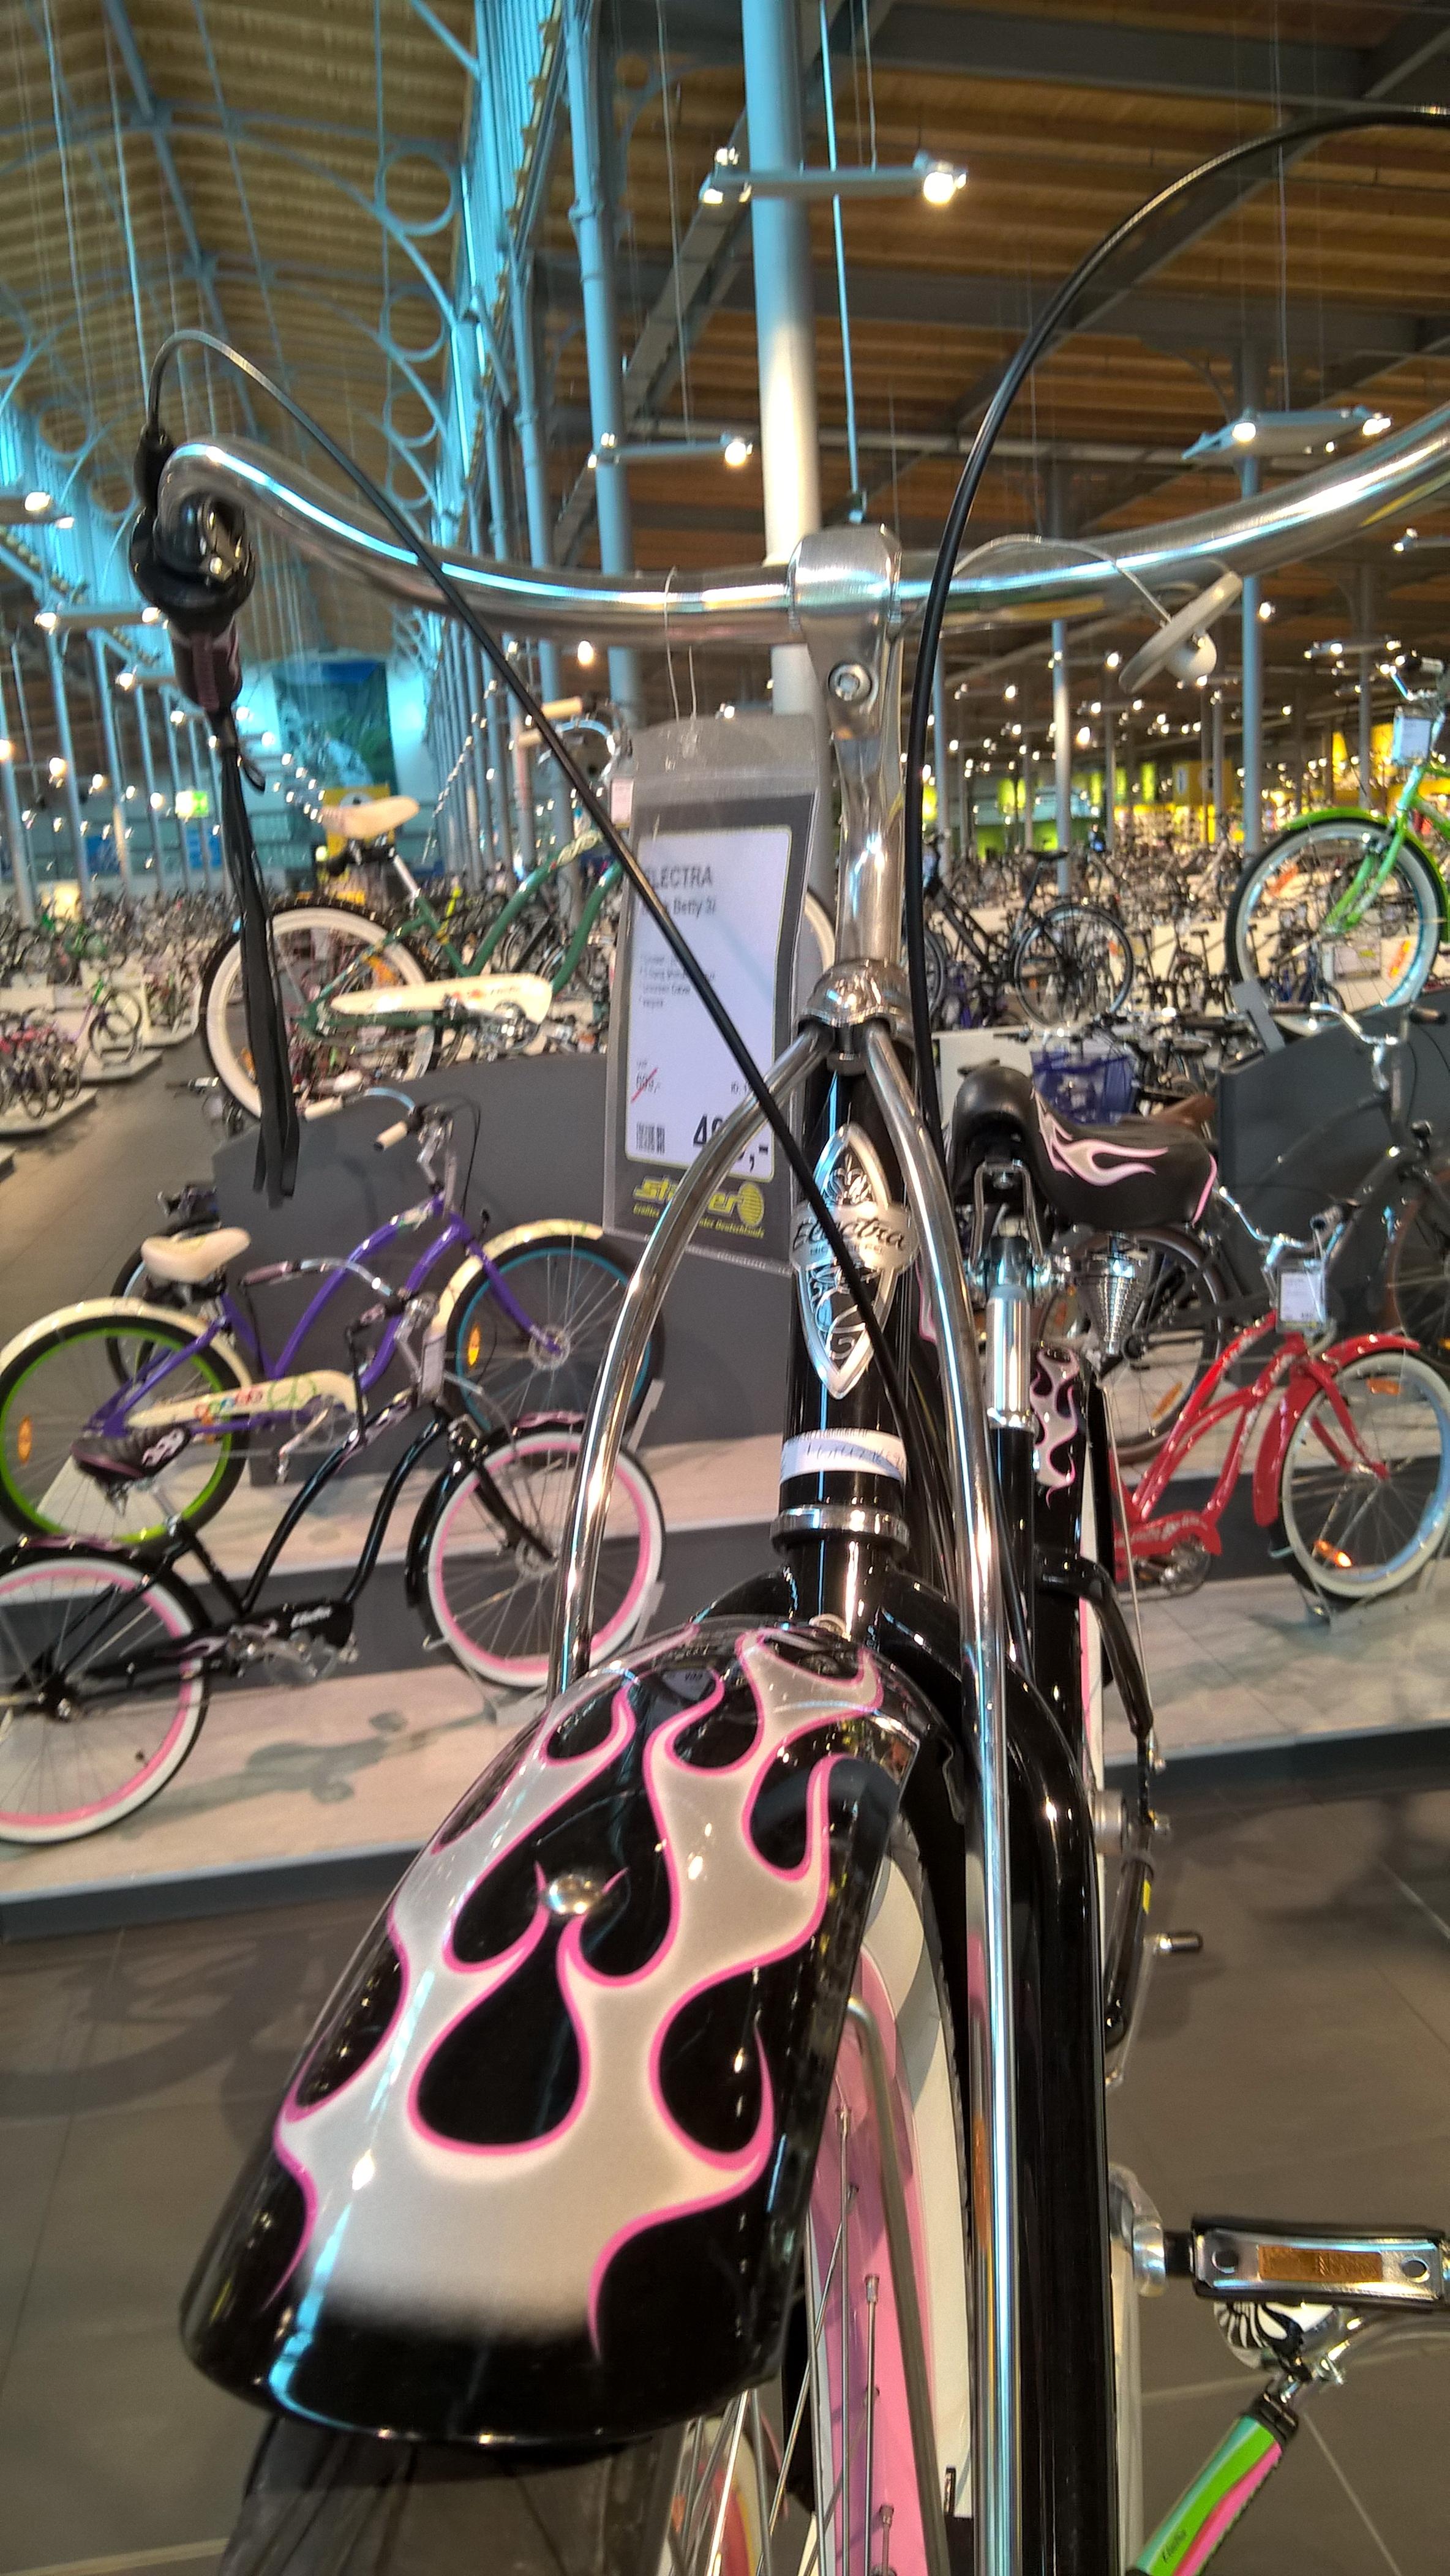 16-07-20-Electra-Bike-WP 20160711 14 47 57 Pro.jpg